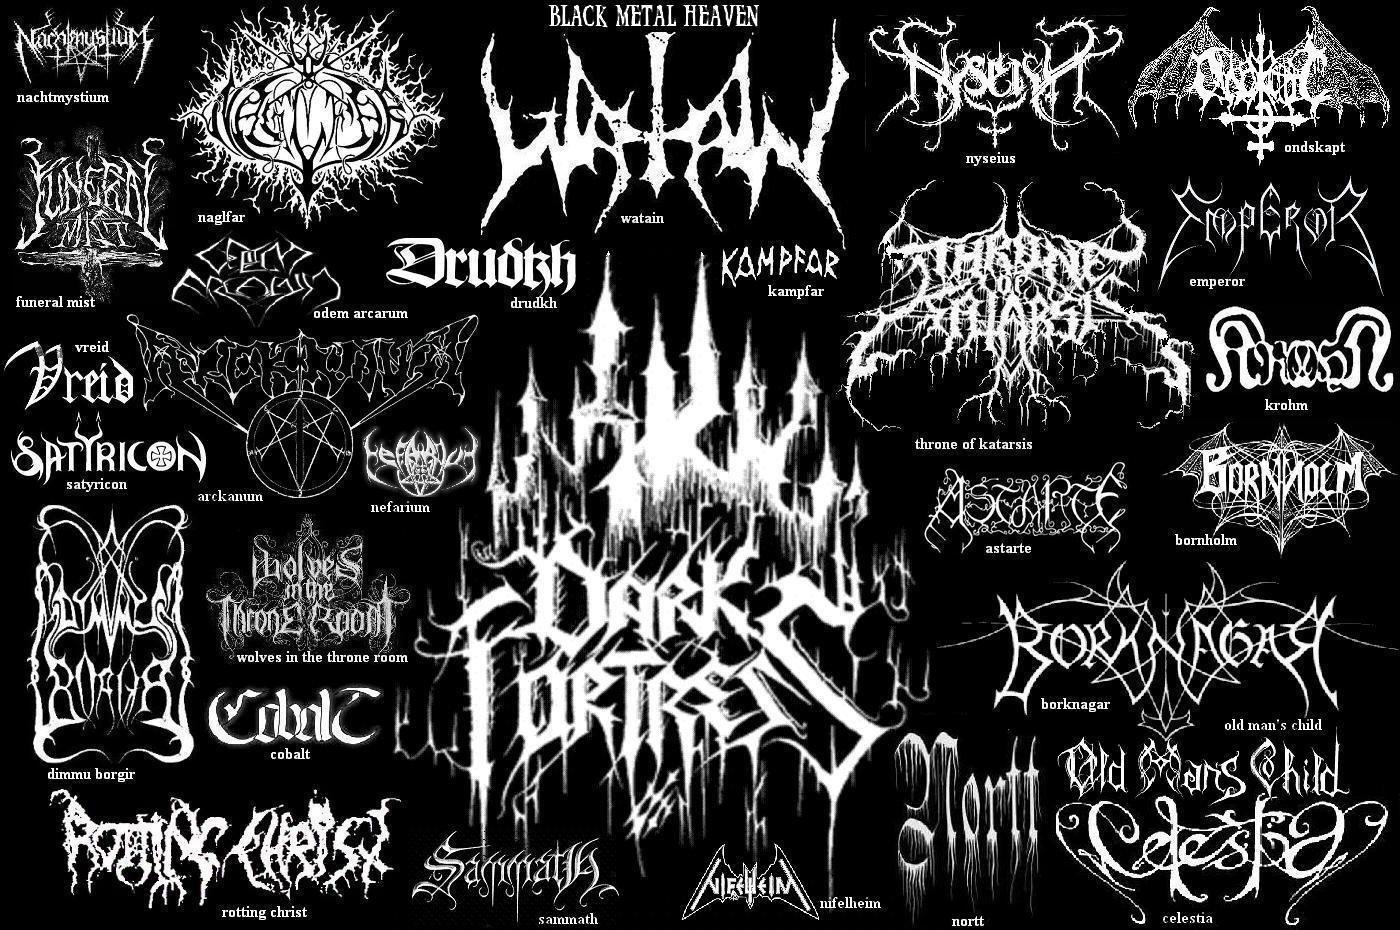 illegible black metal logo - photo #25